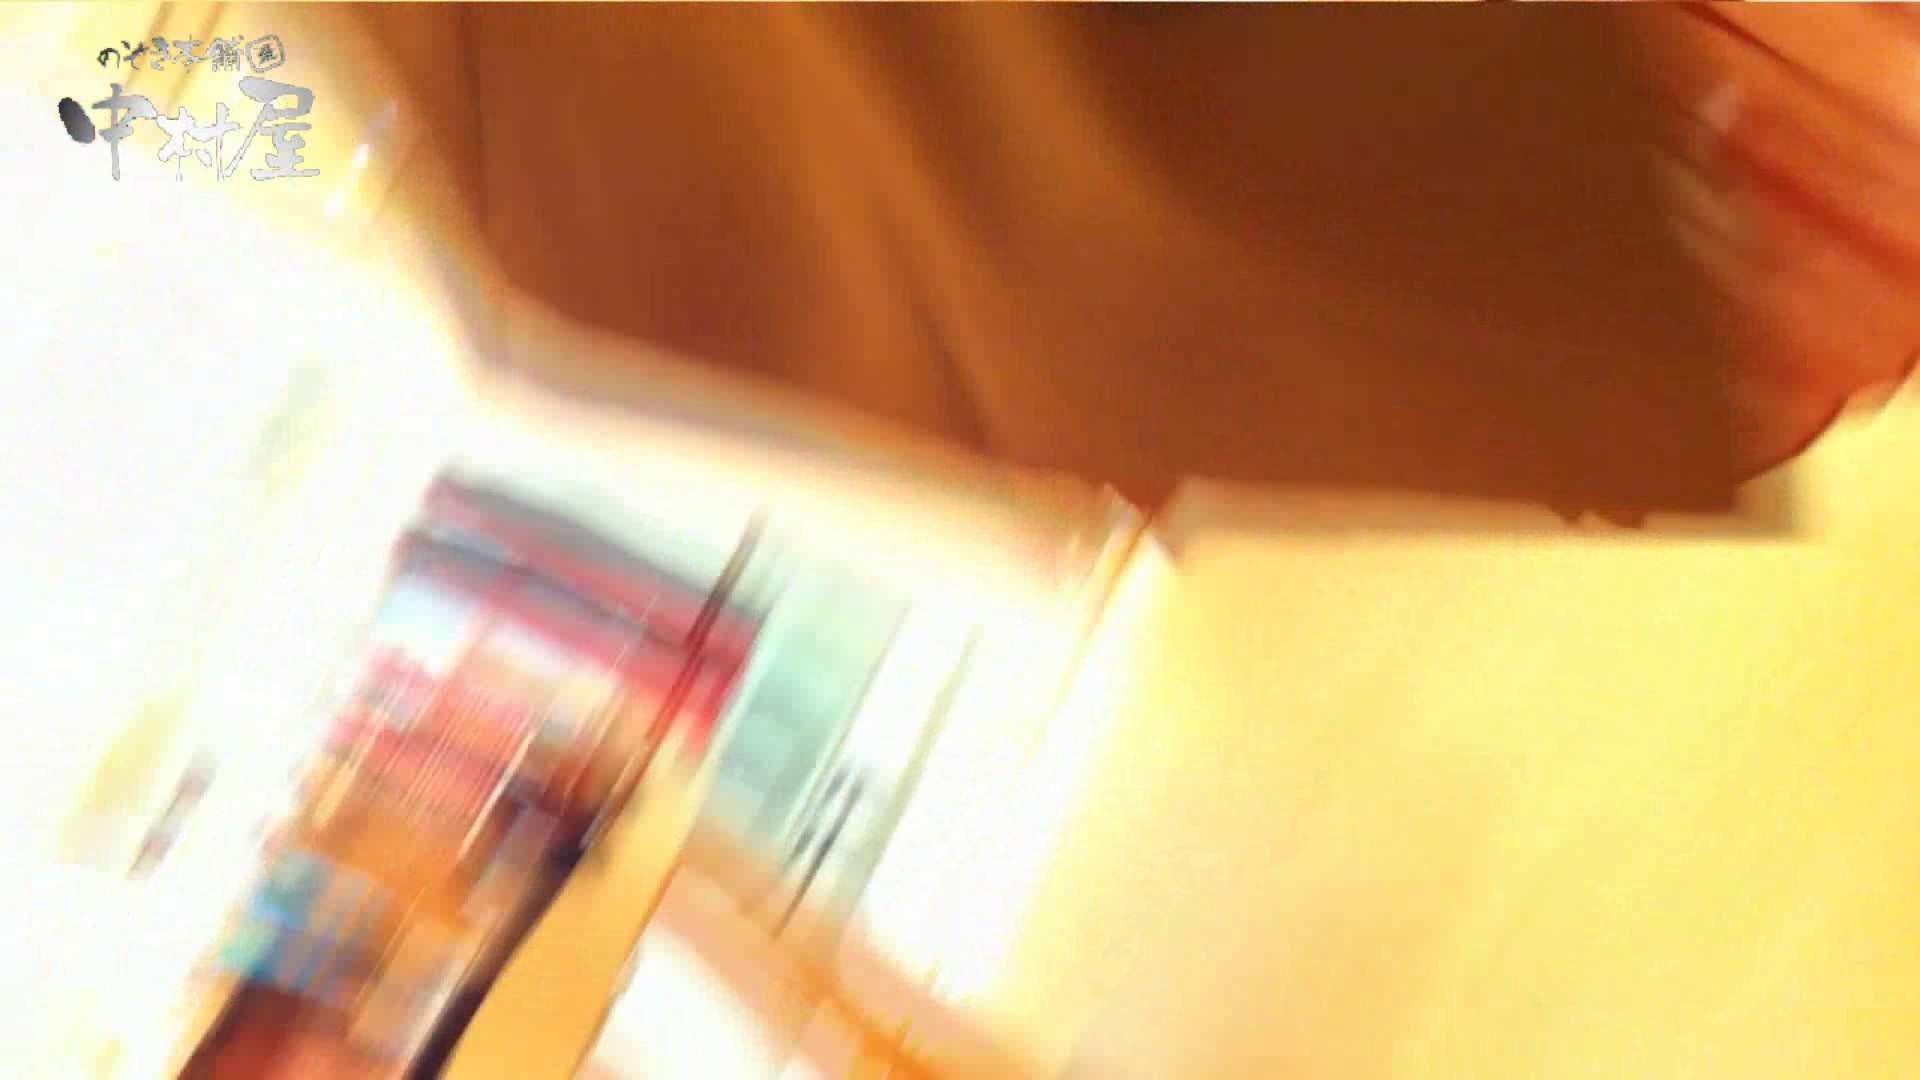 vol.45 可愛いカリスマ店員限定‼胸チラ&パンチラ 食い込みミッキーマウス! チラ見せヌード アダルト動画キャプチャ 103画像 80